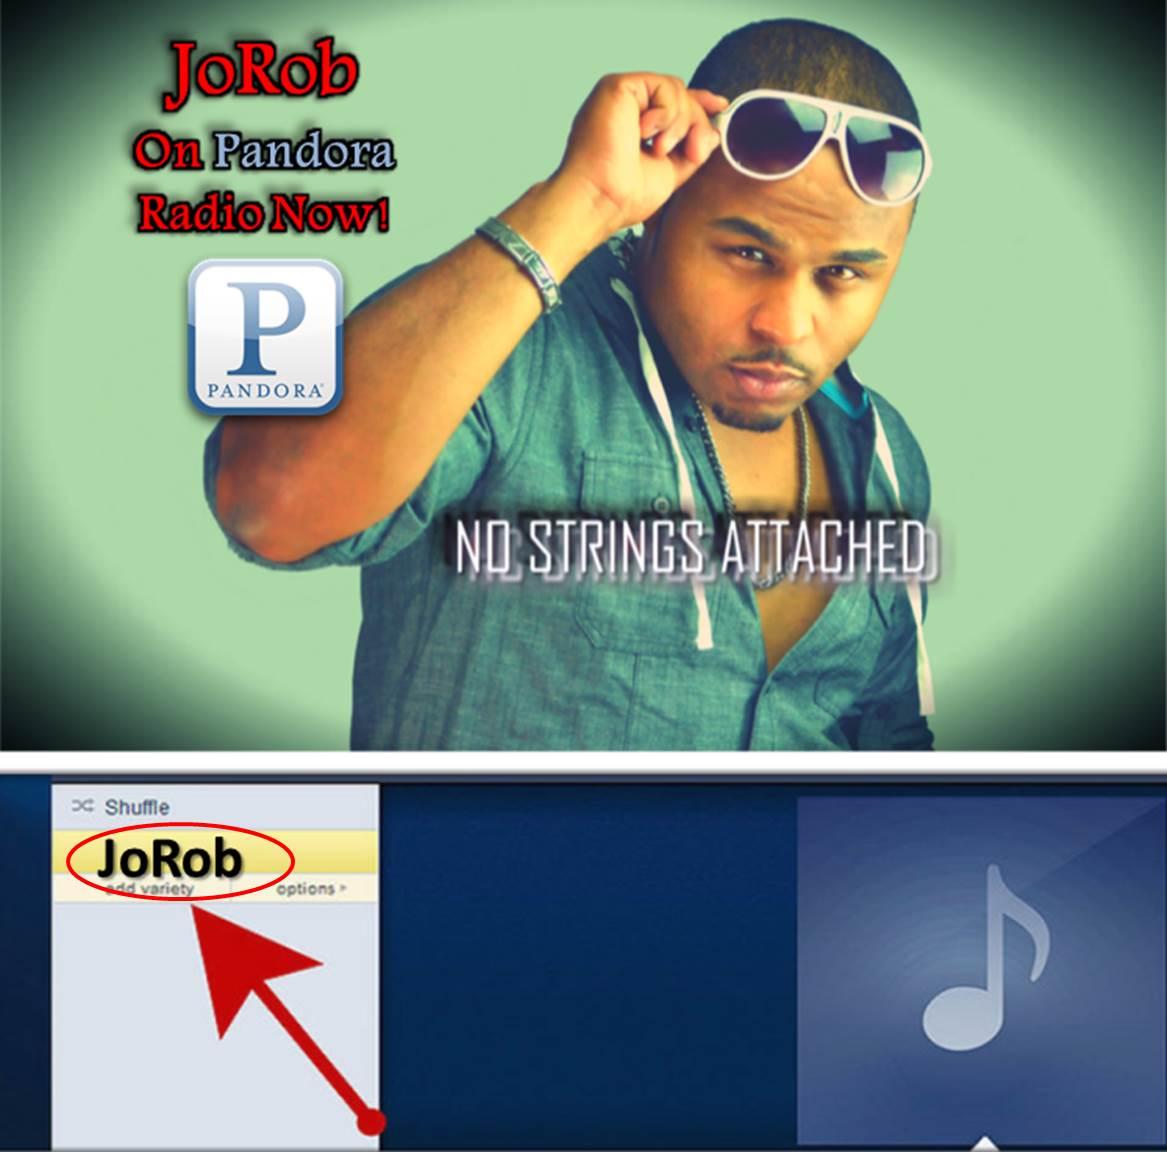 Listen 2 @JoRobisMusic on @pandora_radio (@SonyMusicGlobal)Today add JoRob 2 ur #Pandora Radio http://t.co/yU48aHmwVw http://t.co/ZP6yg4OR8S